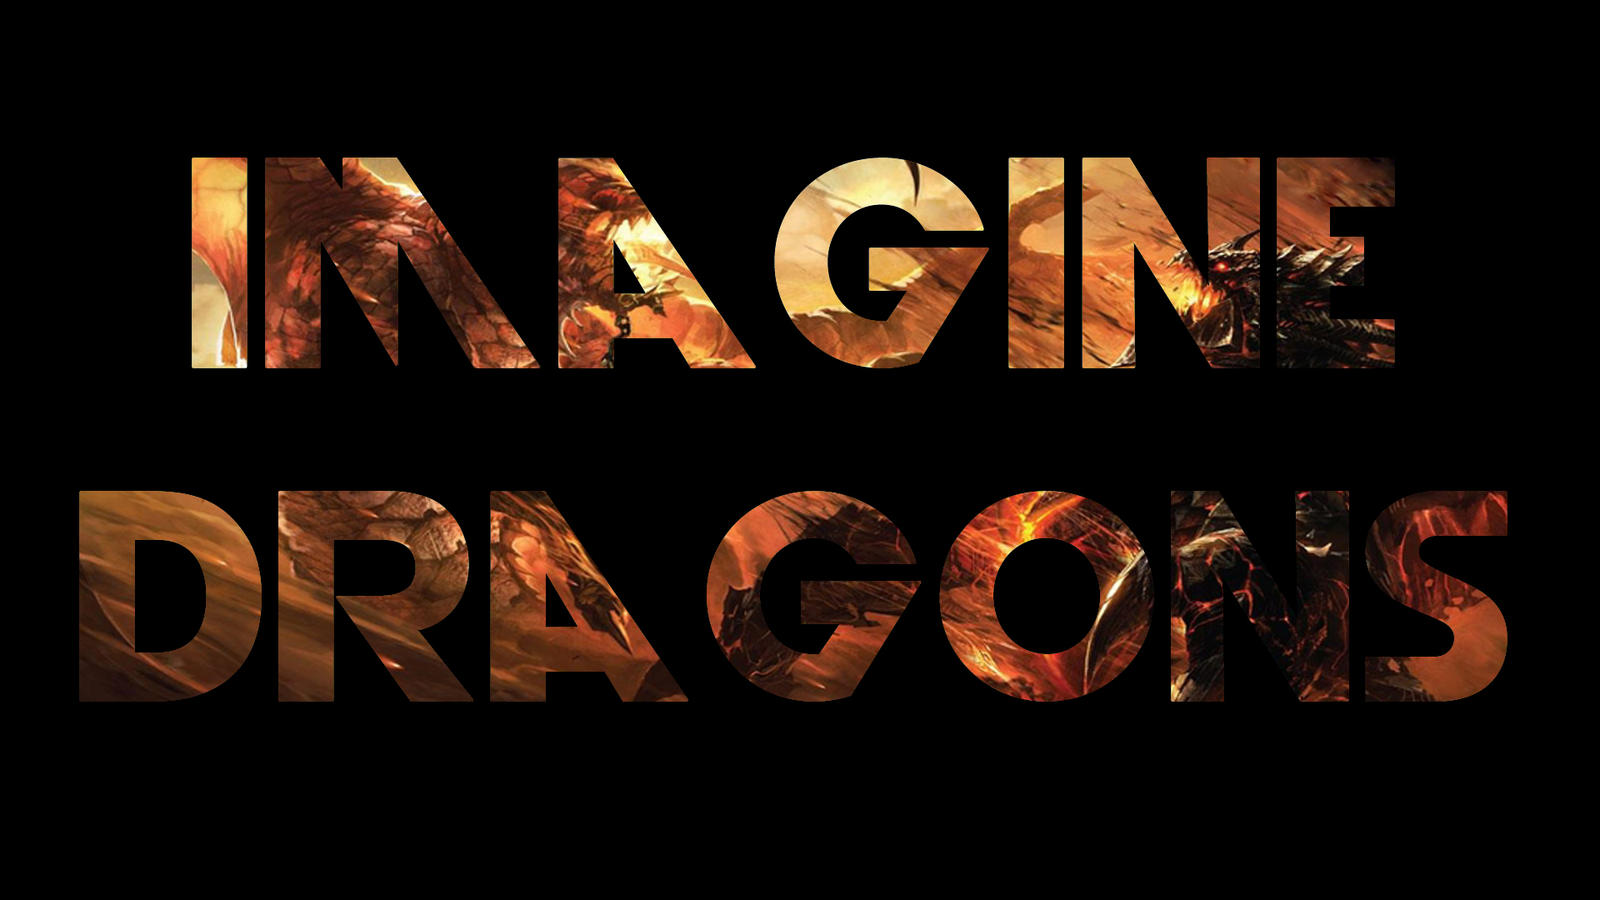 Imagine dragons by TheUnforgivingsArmy